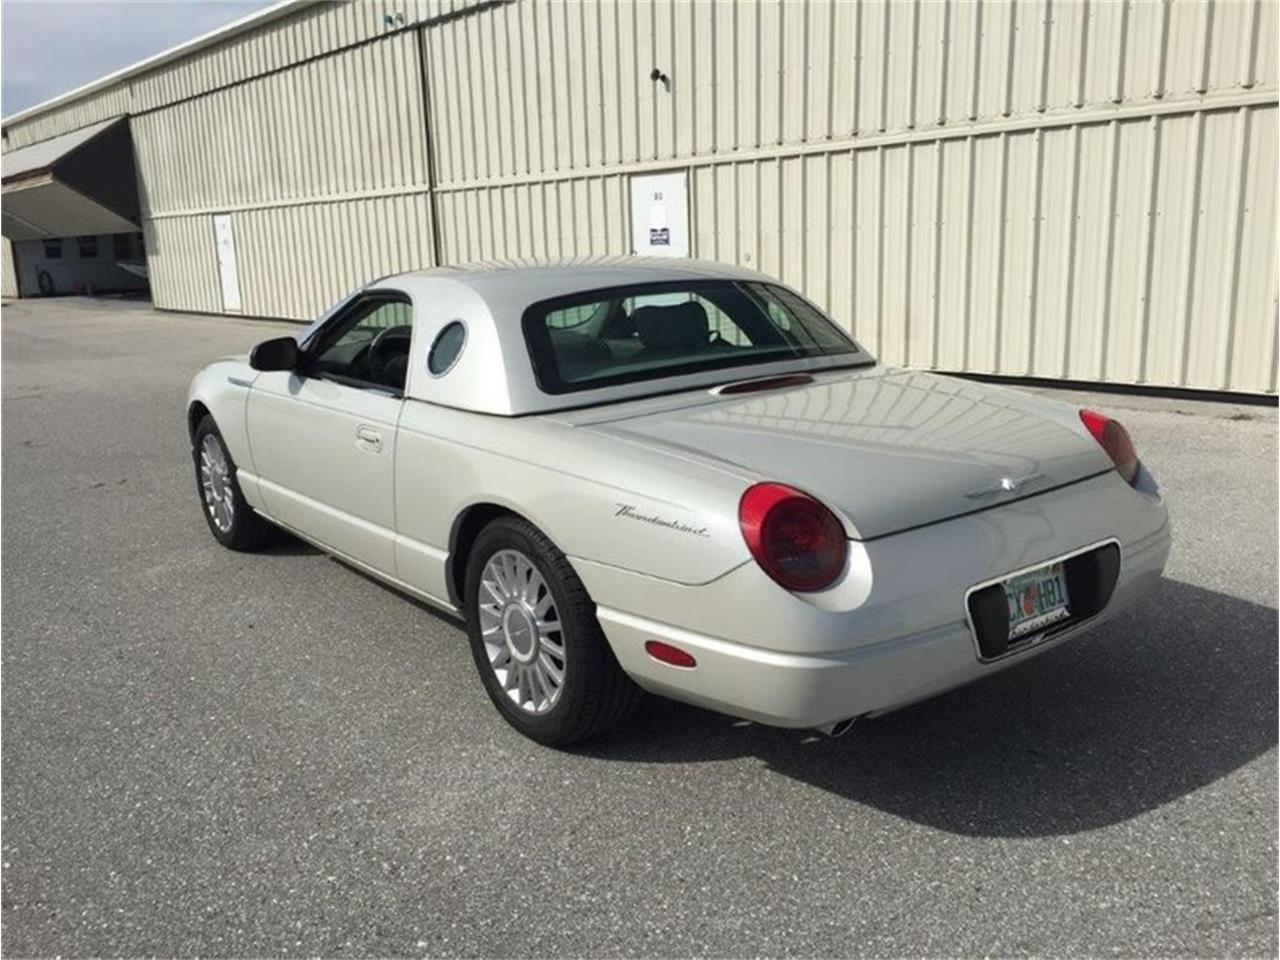 2005 Ford Thunderbird (CC-1415144) for sale in Punta Gorda, Florida